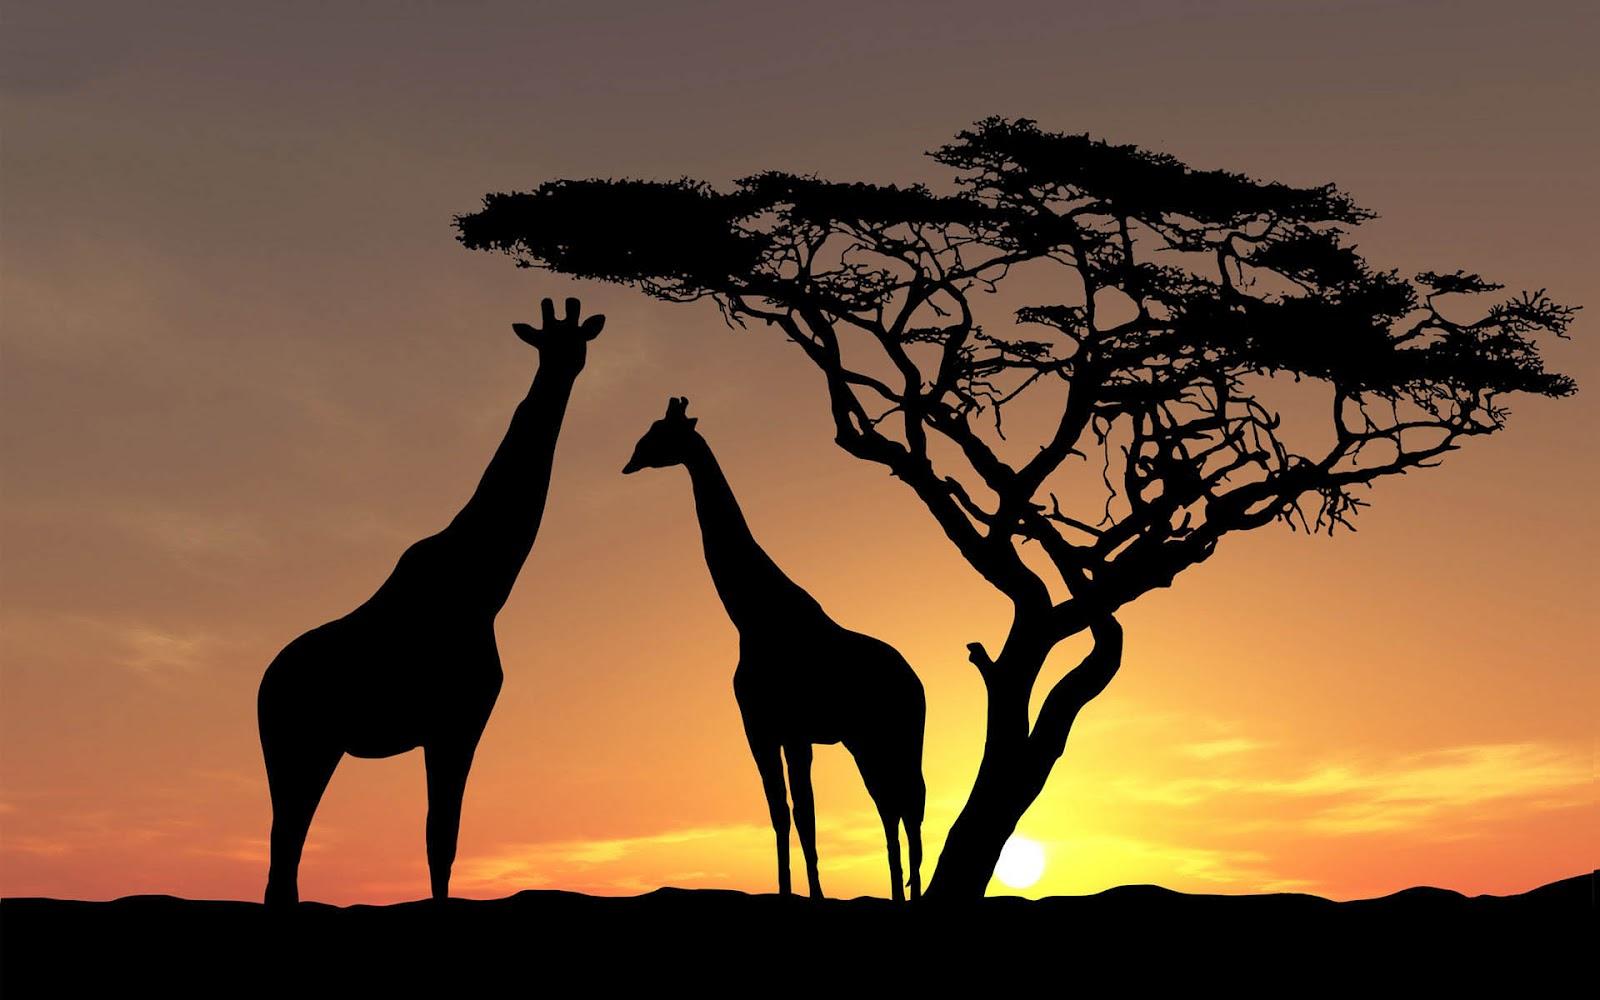 so nice giraffe image